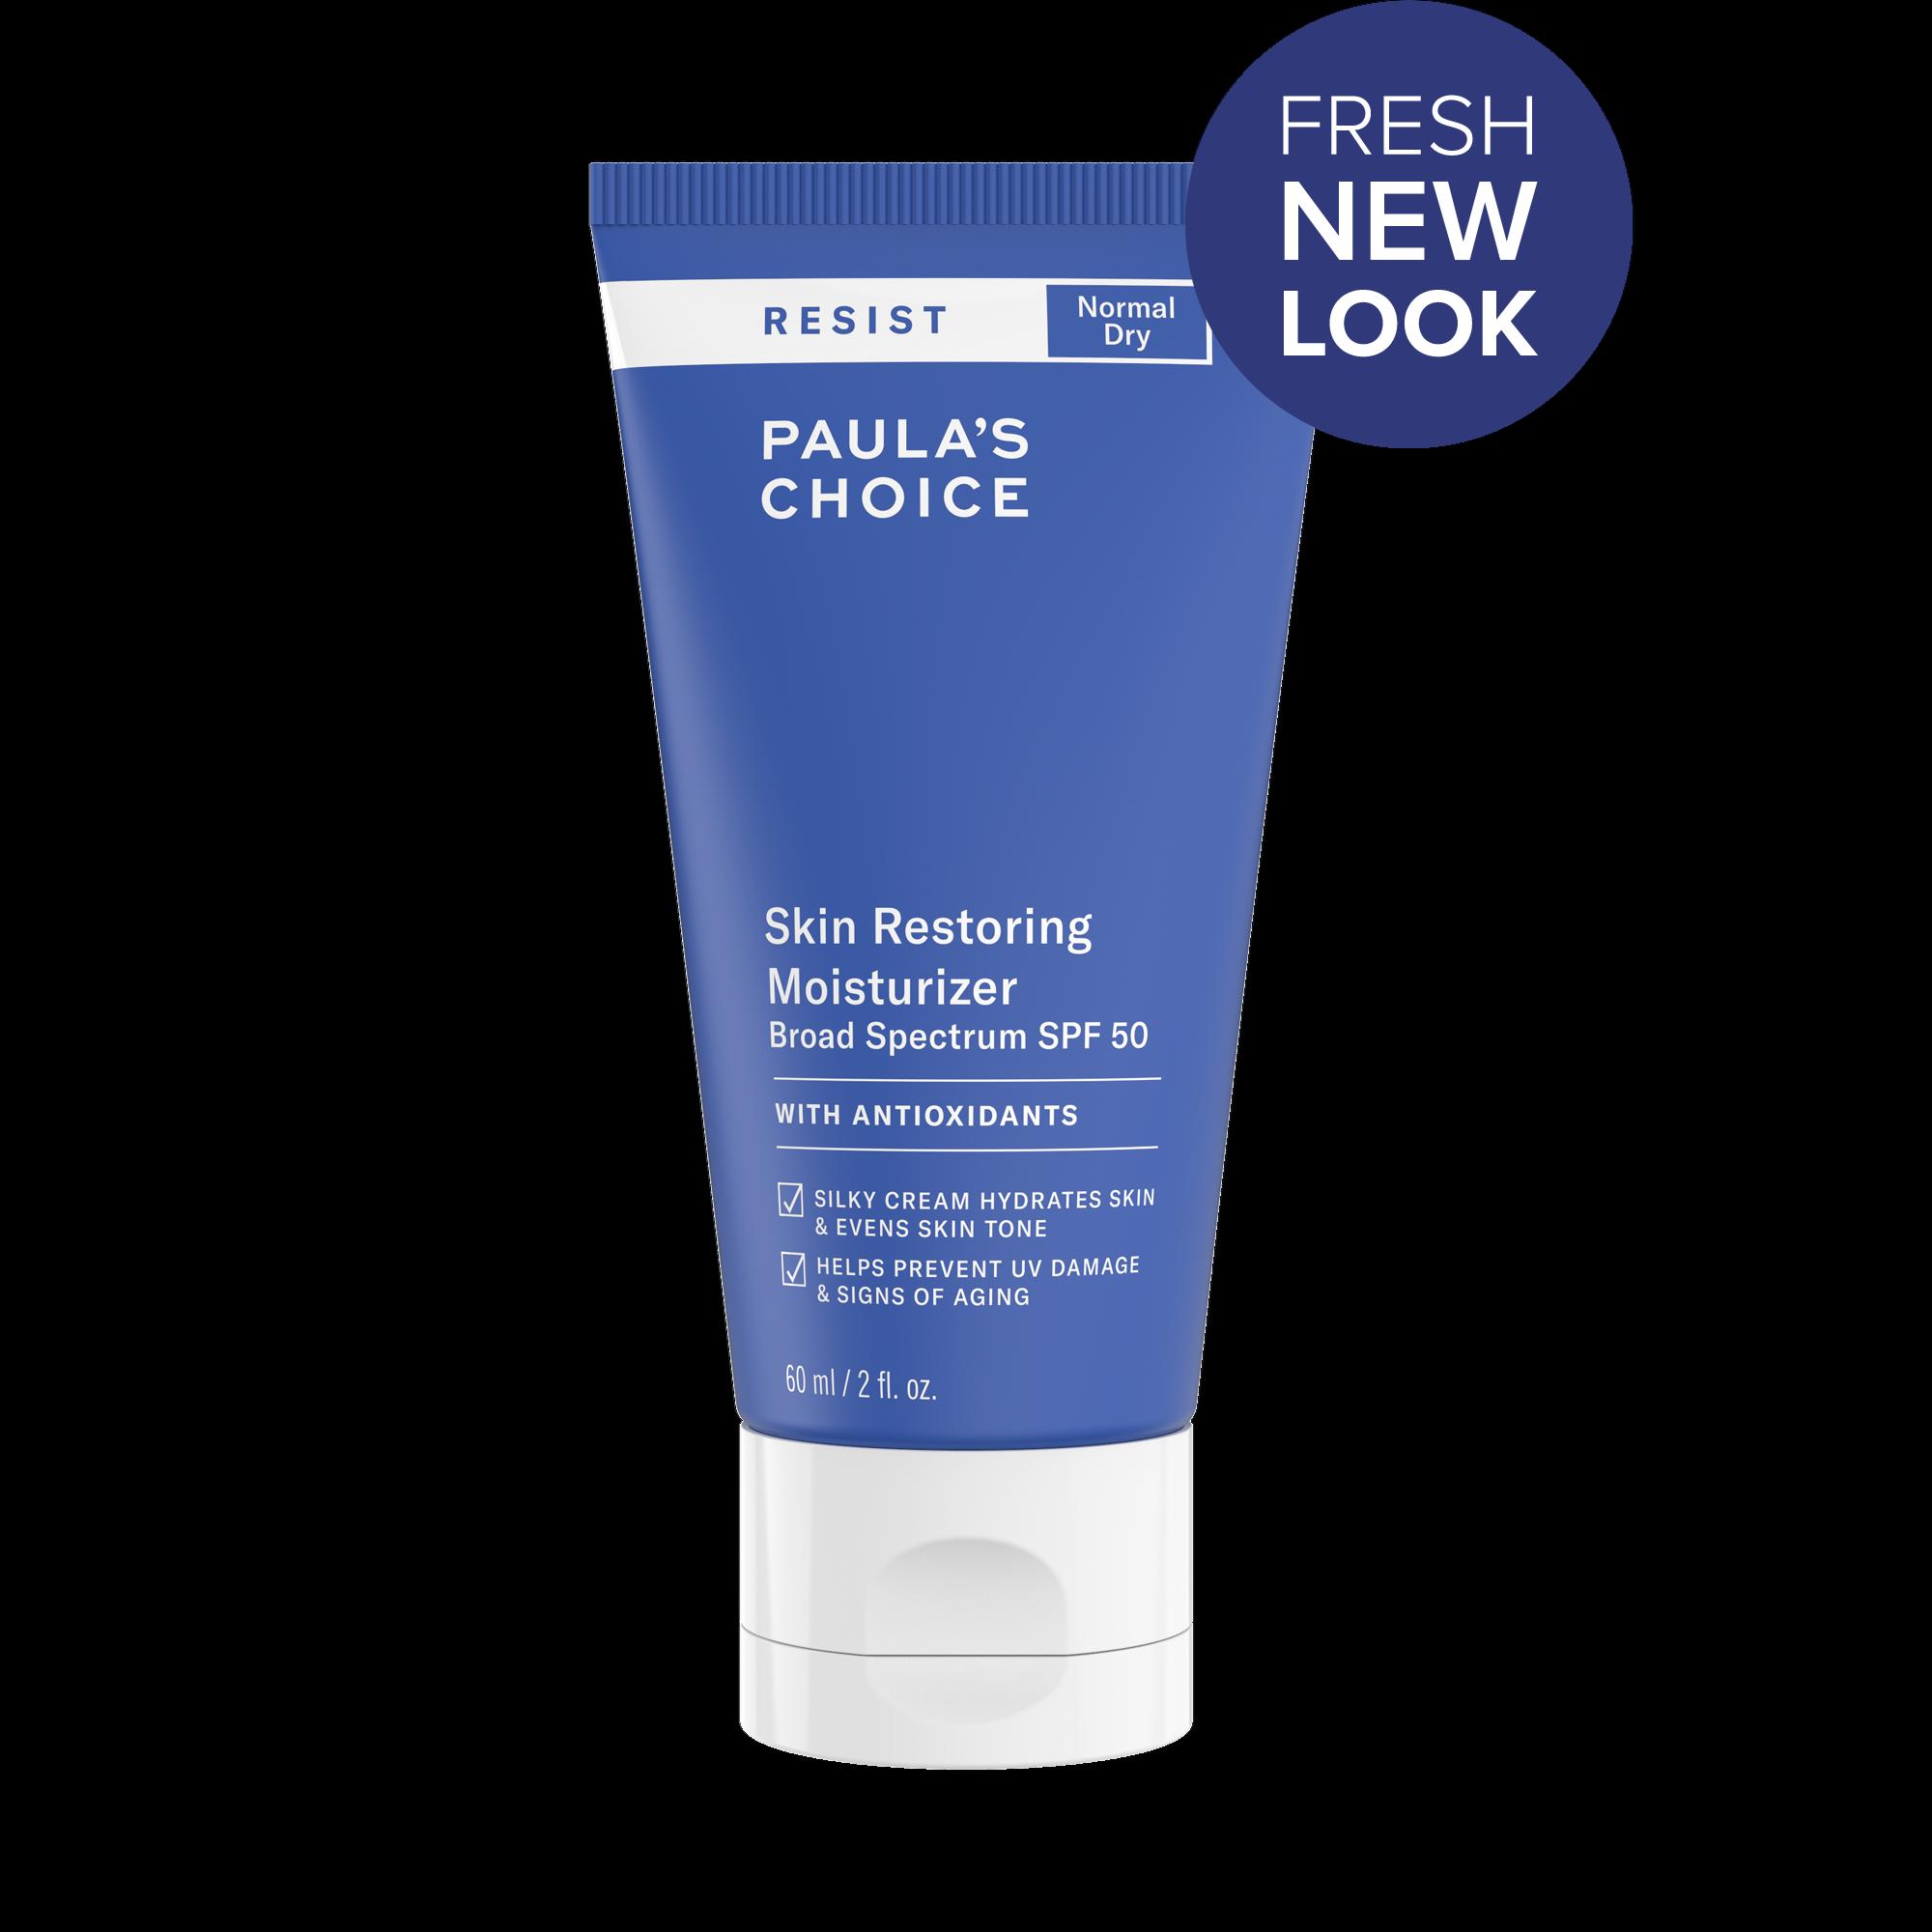 RESIST Skin Restoring Moisturizer with SPF 50 | Paula's Choice.